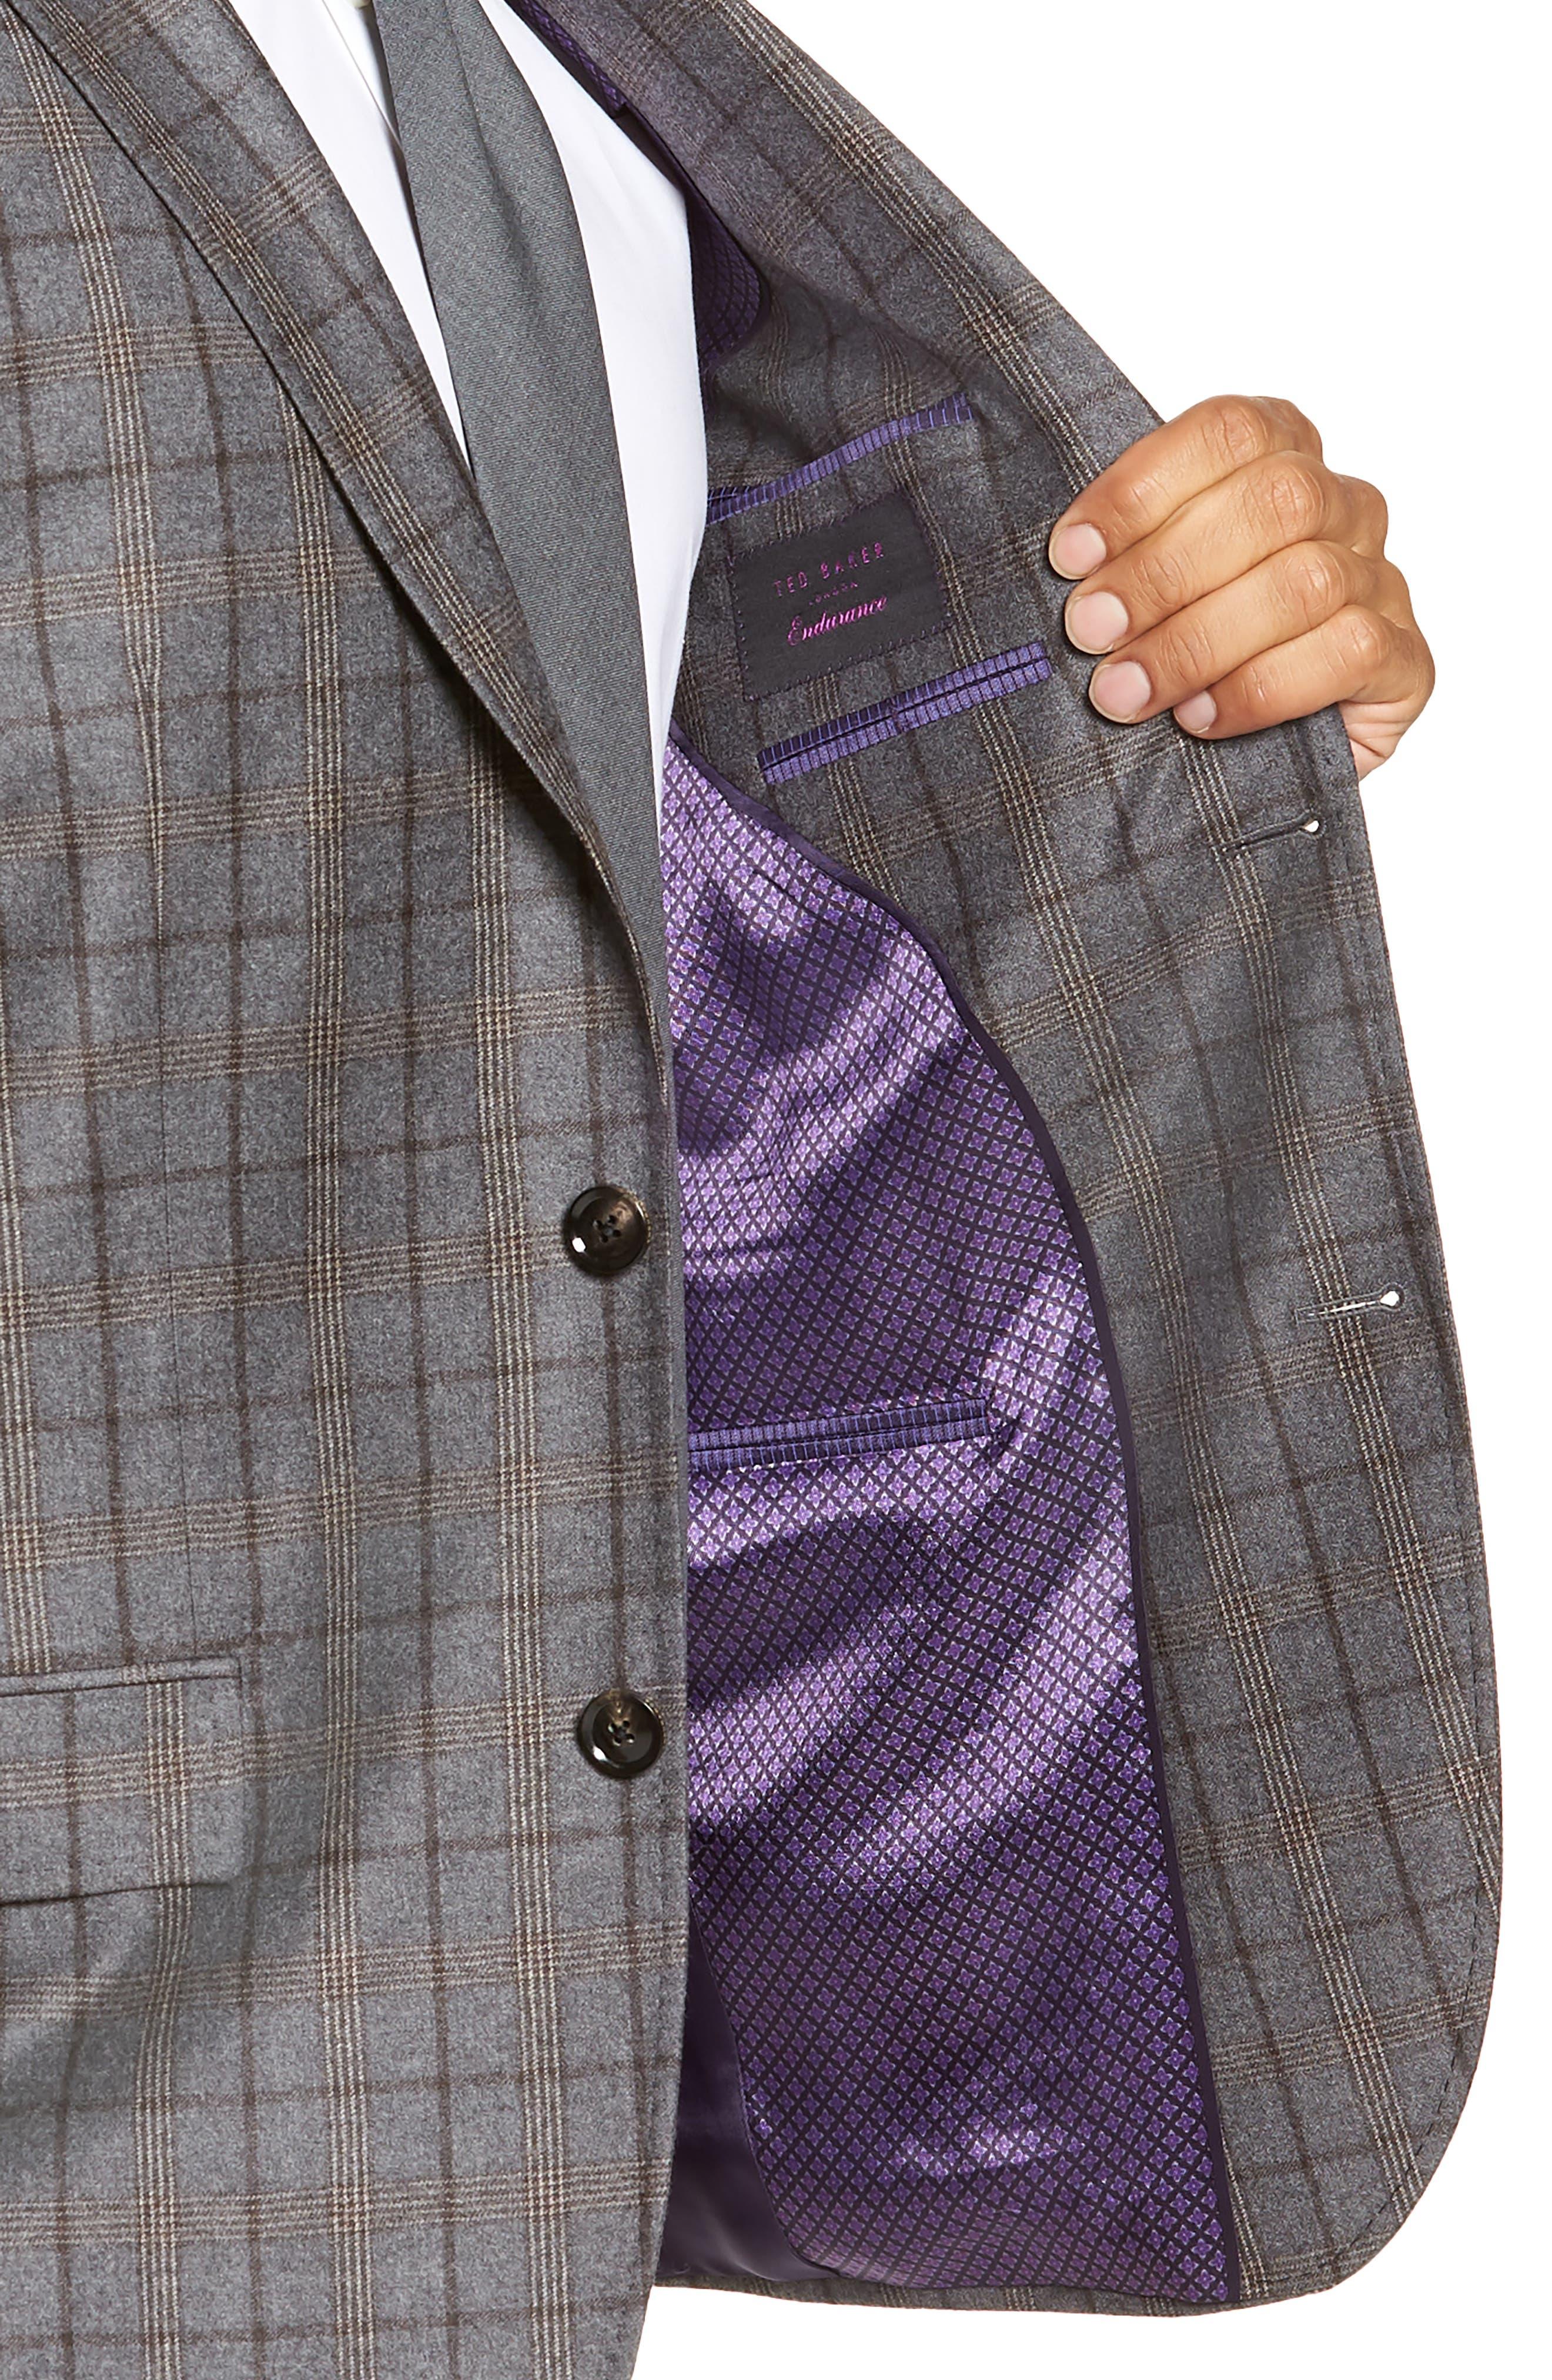 Konan 2B Trim Fit Wool Sport Coat,                             Alternate thumbnail 3, color,                             LIGHT GREY